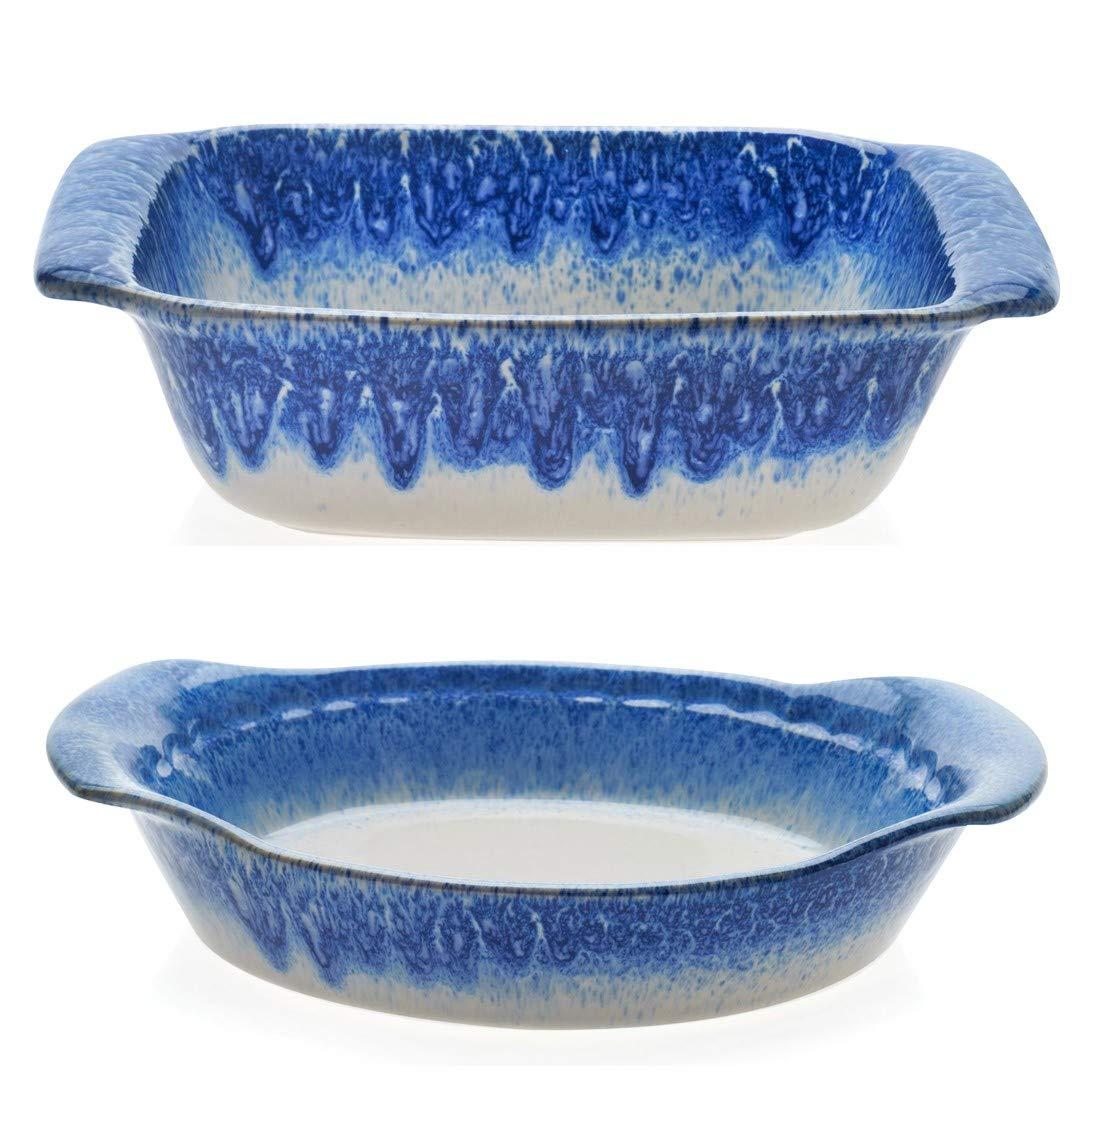 Libbey Artisan Glazed Ceramic Stoneware Square Bake Dish Bundled with Pie Plate Baker Dish, Blue and Cream